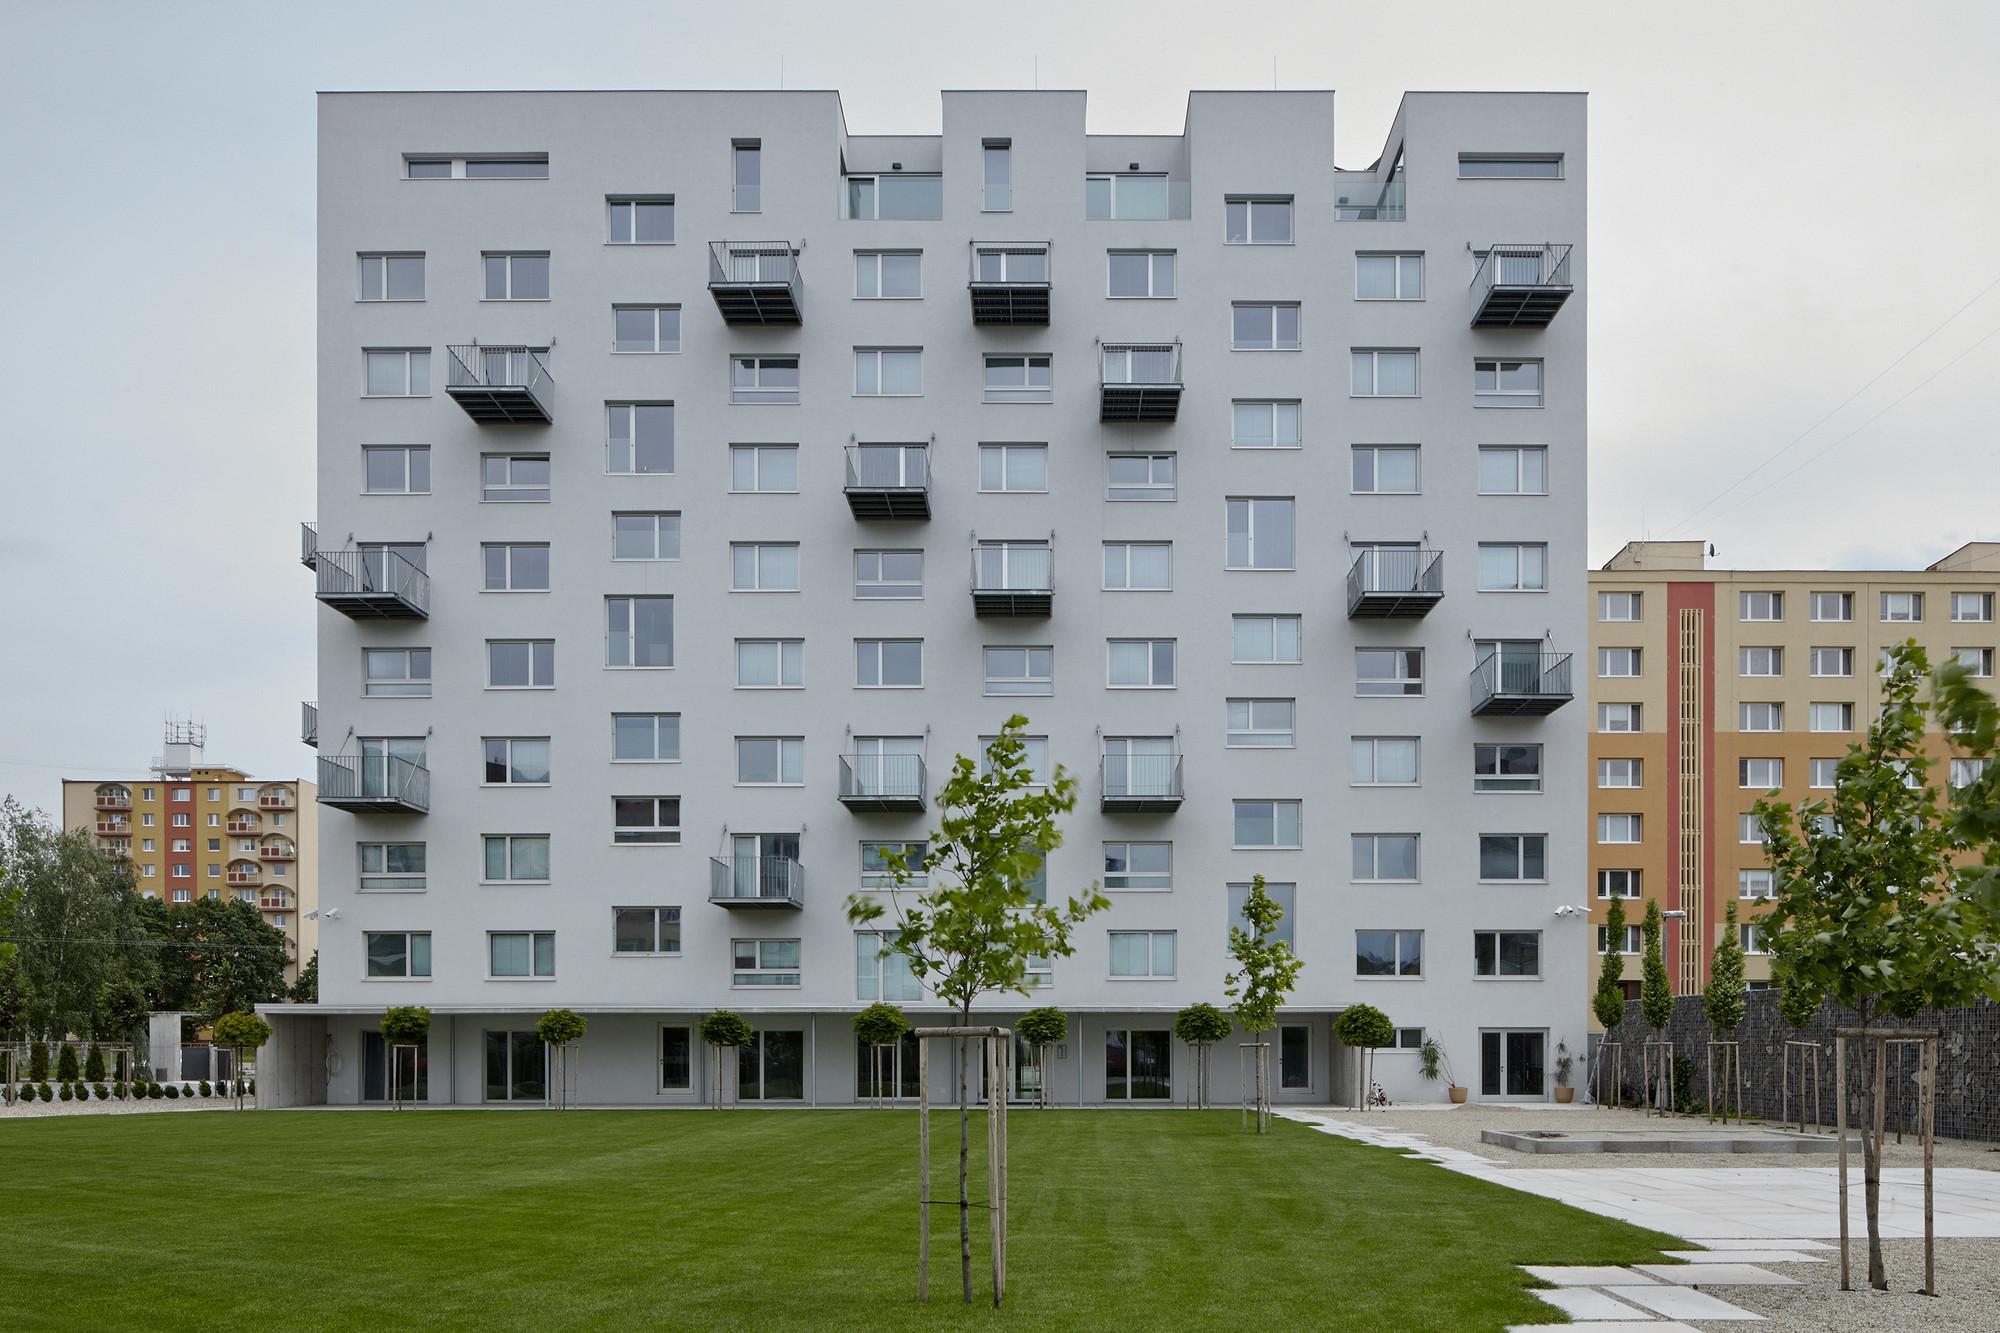 Prefab House In Rimavska Sobota  / GutGut, © Jakub Skokan a Martin Tůma (BoysPlayNice)